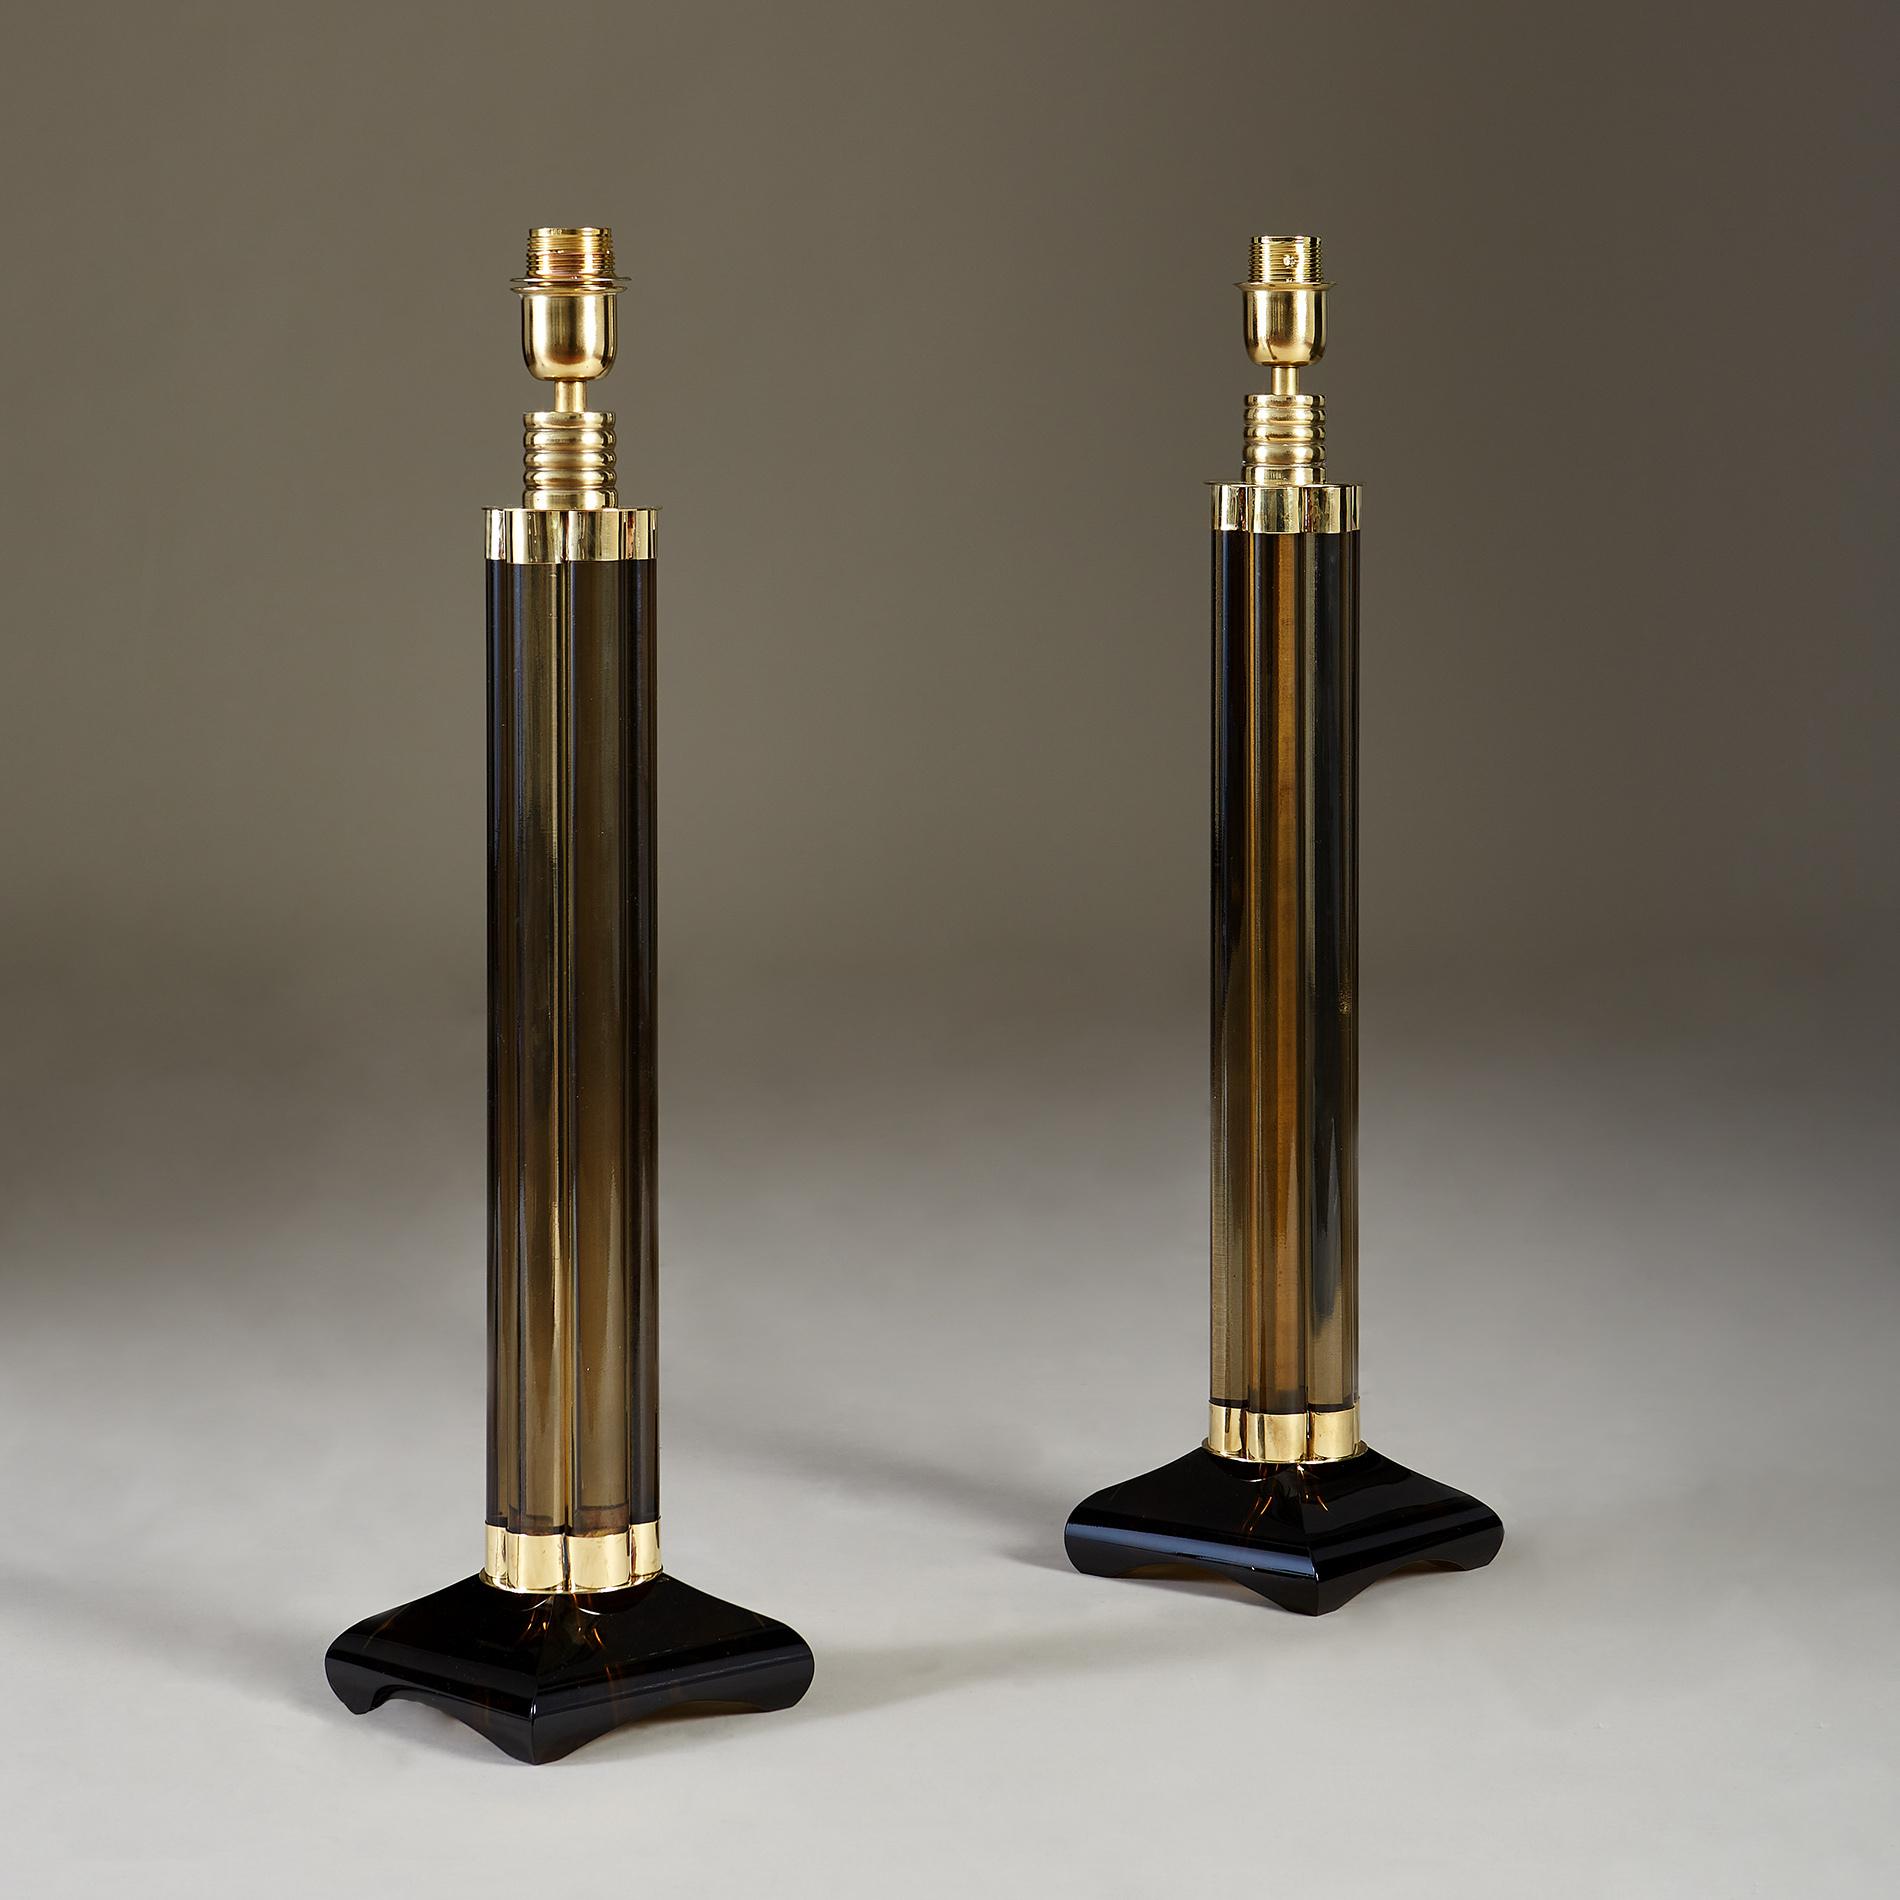 Smokey Crystal Column Lamps 20210225 Valerie Wade 2 195 V1